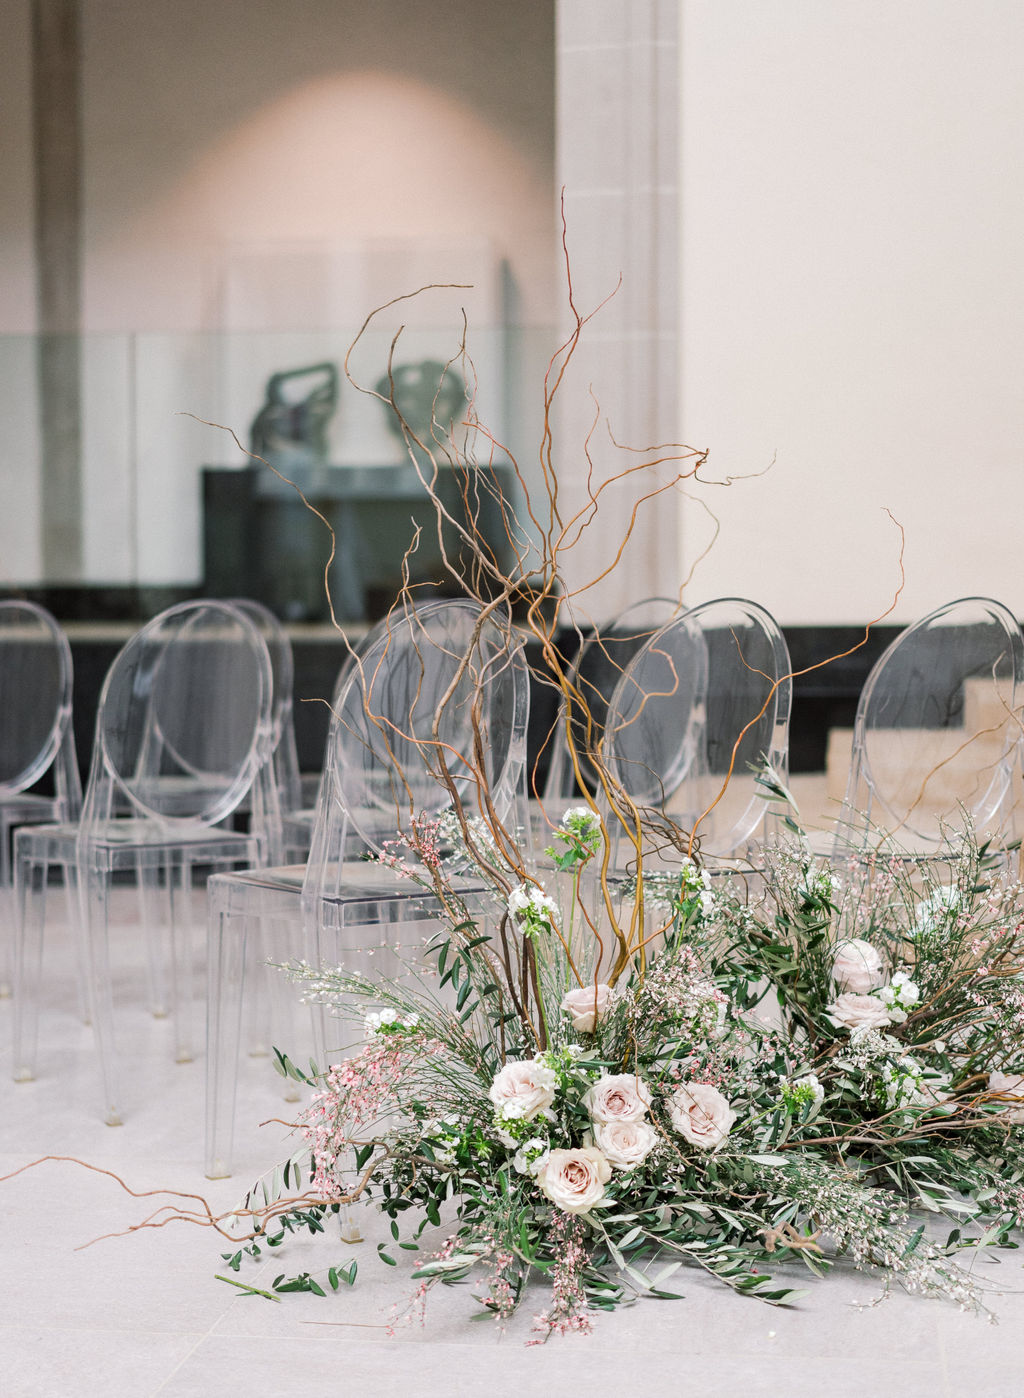 artiese-ago-wedding-editorial-06739.jpg